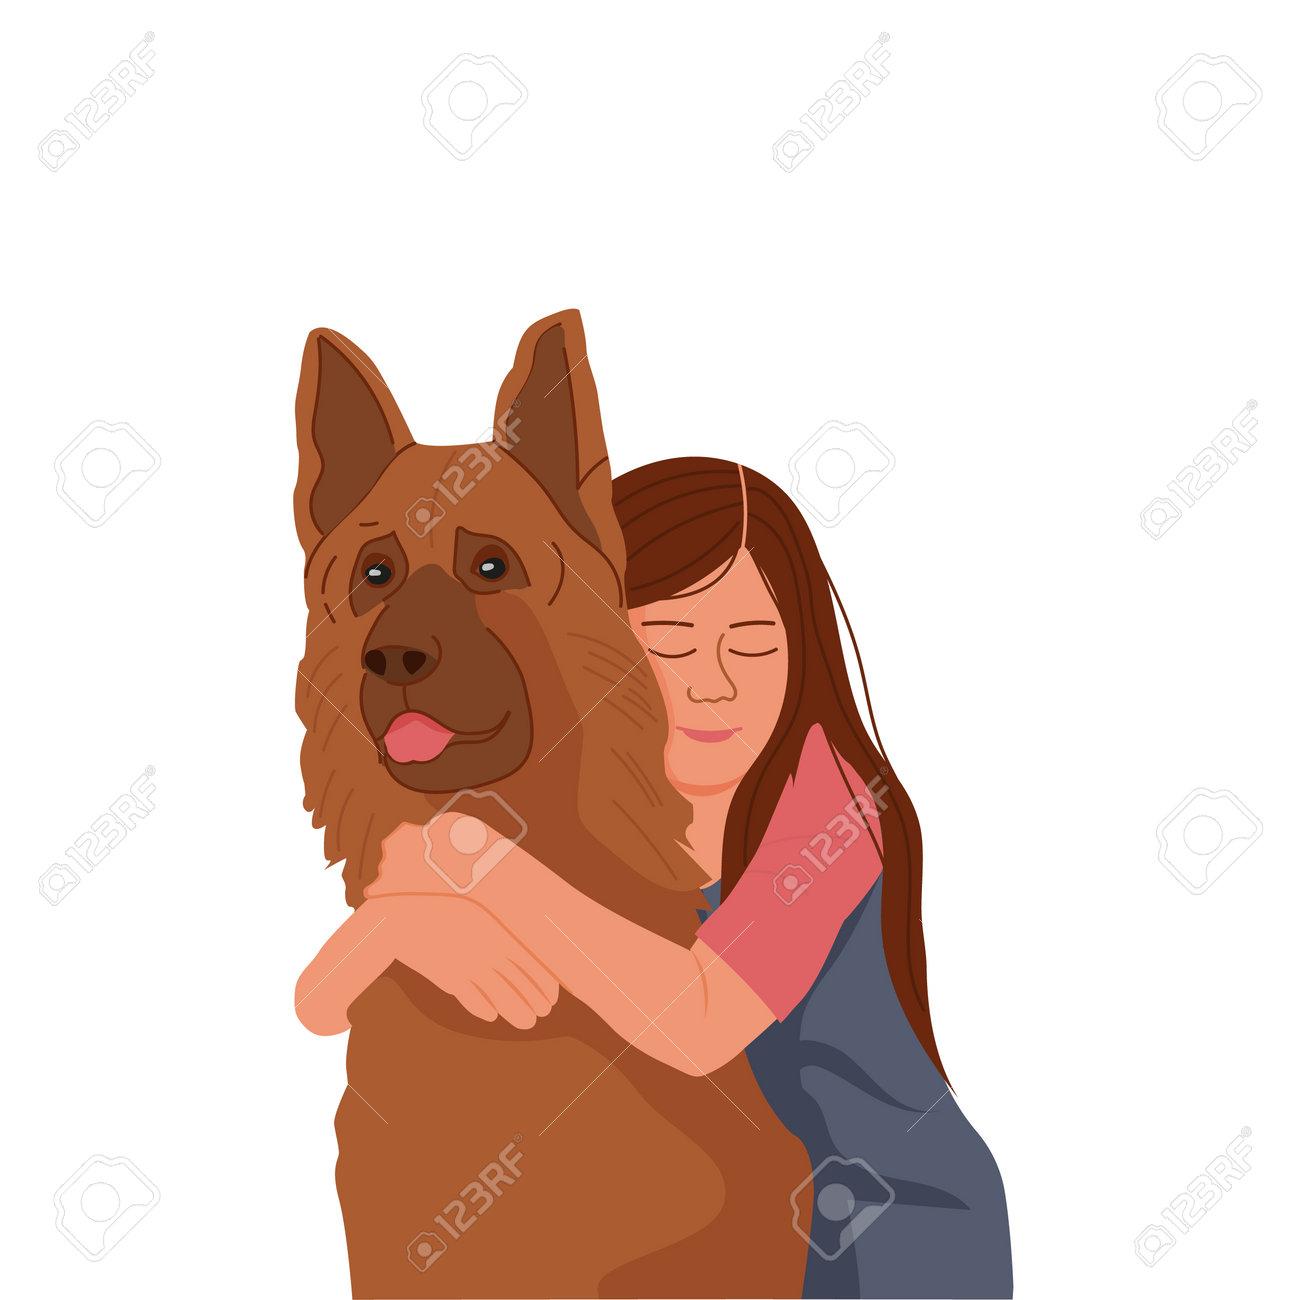 Little girl hugging a dog - 161909306